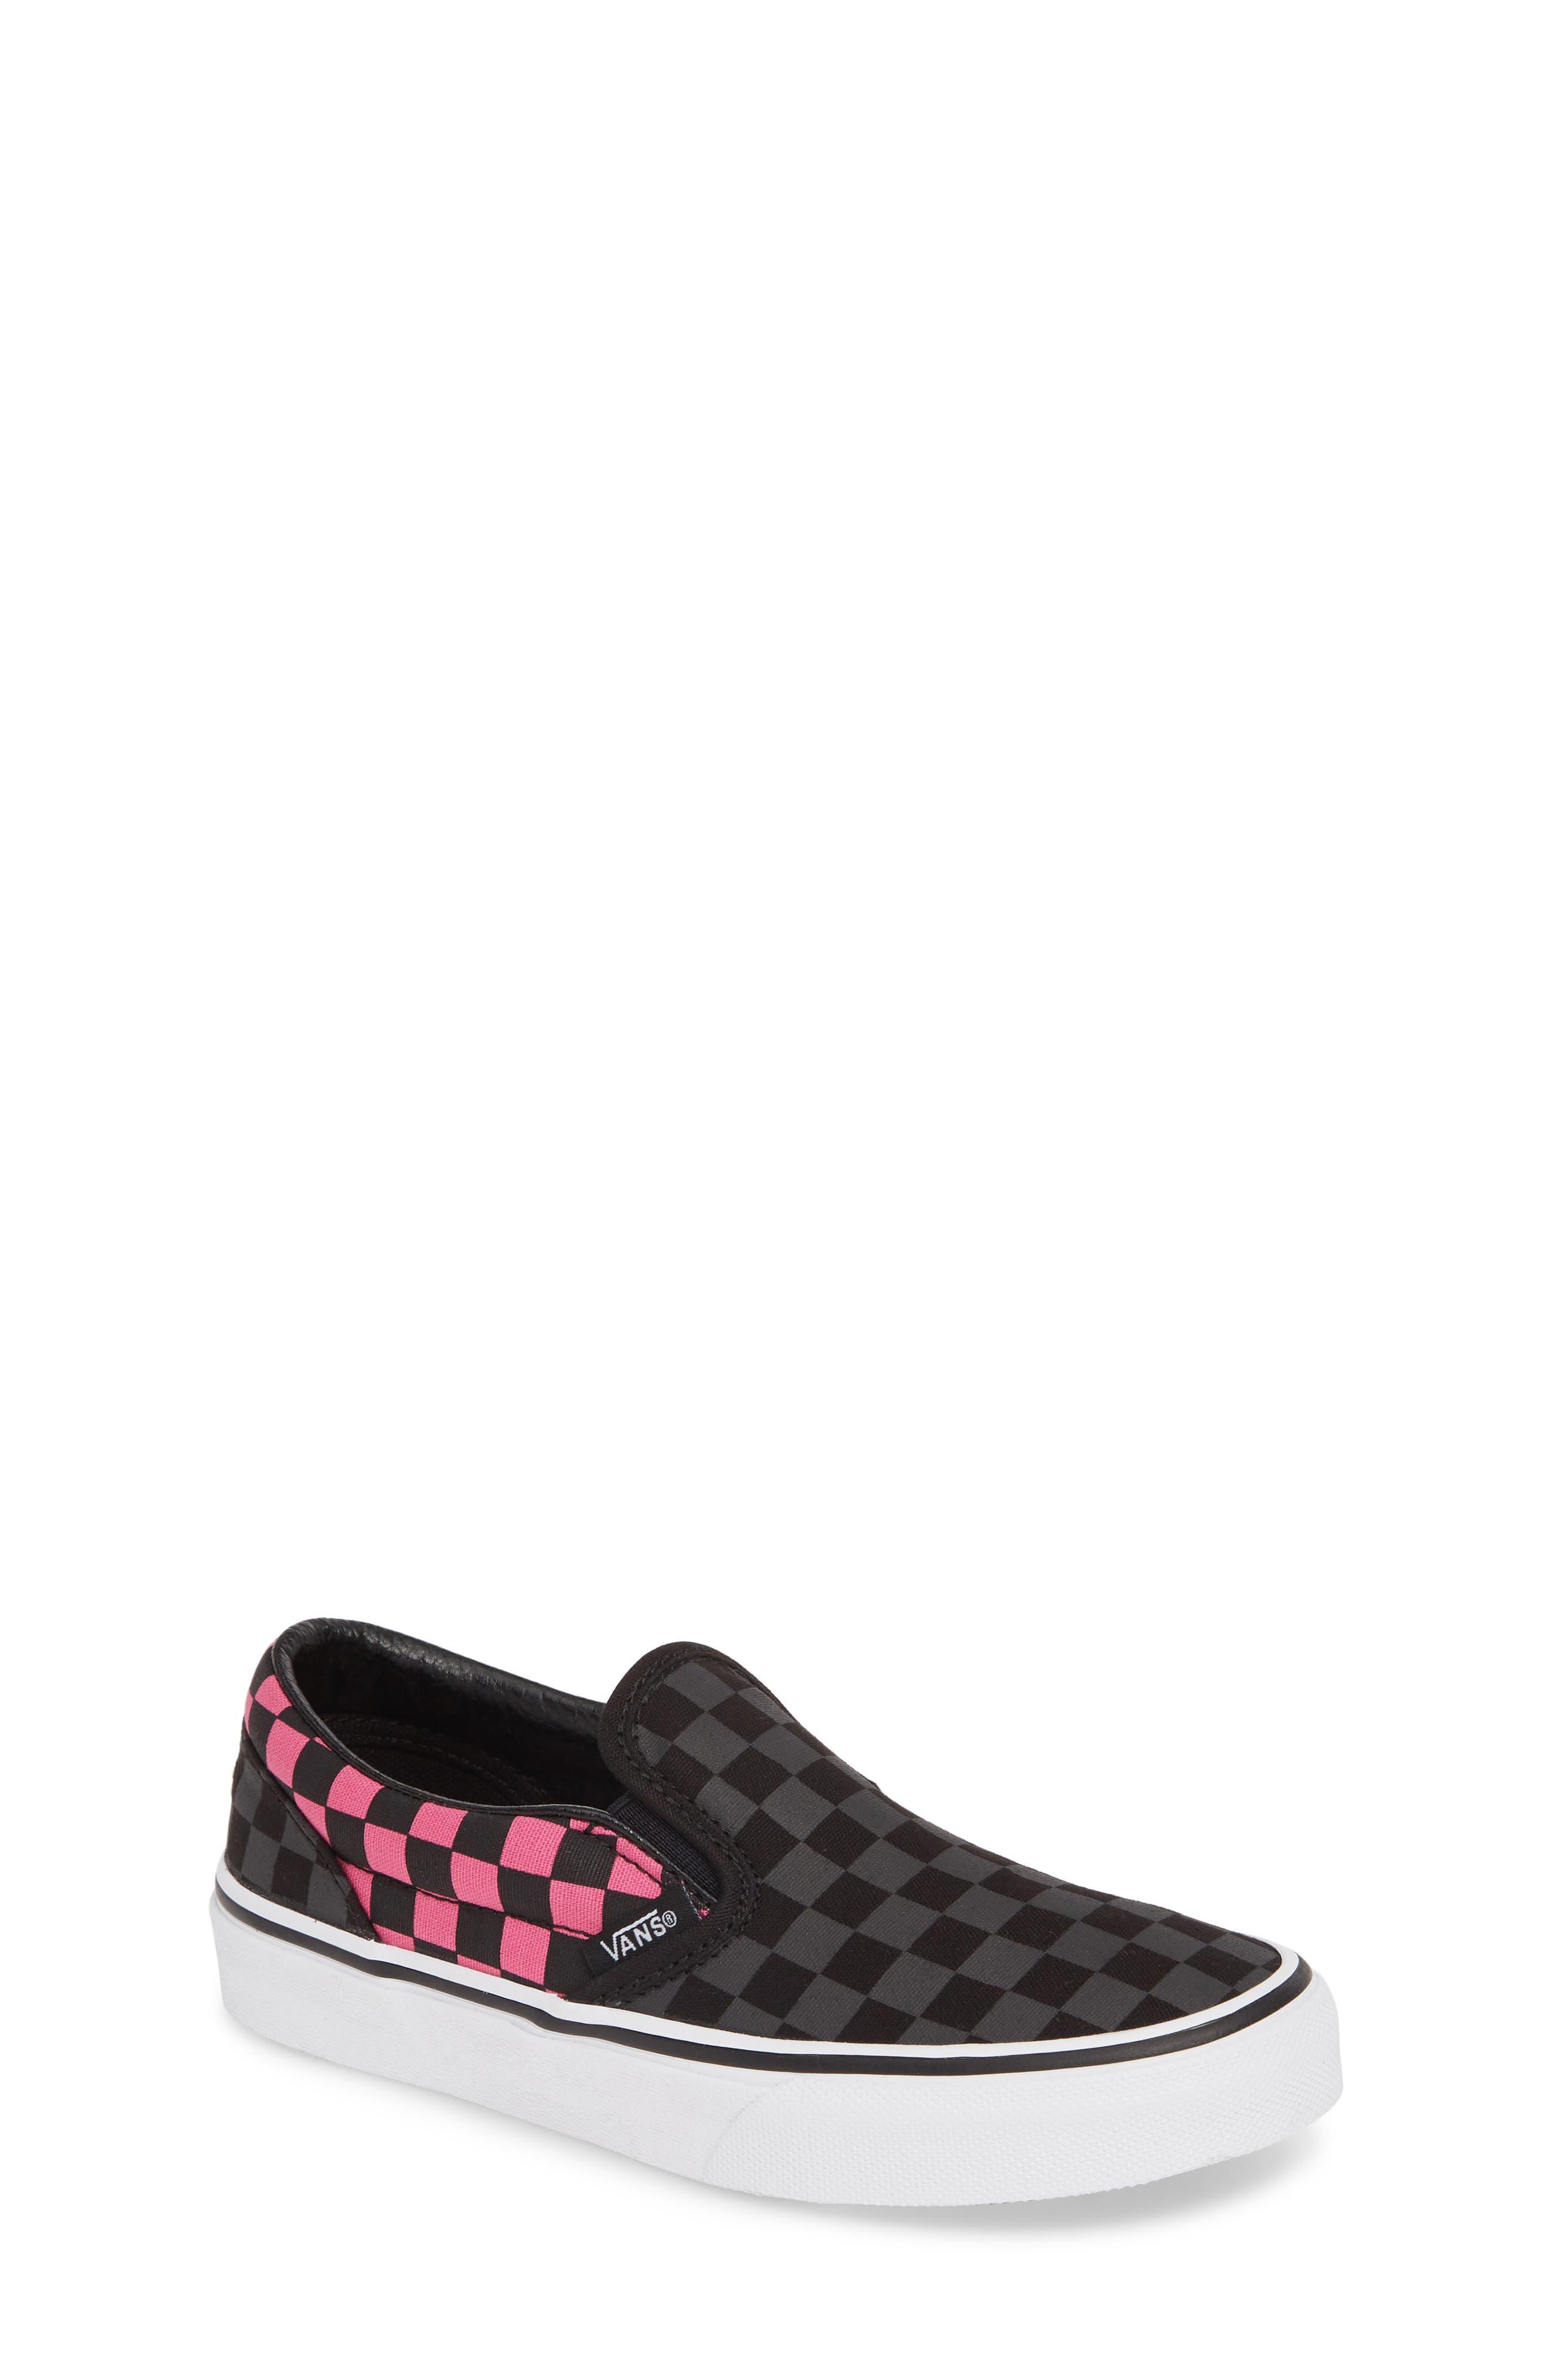 Classic Checker Slip-On, Main, color, CARMINE ROSE/ BLACK